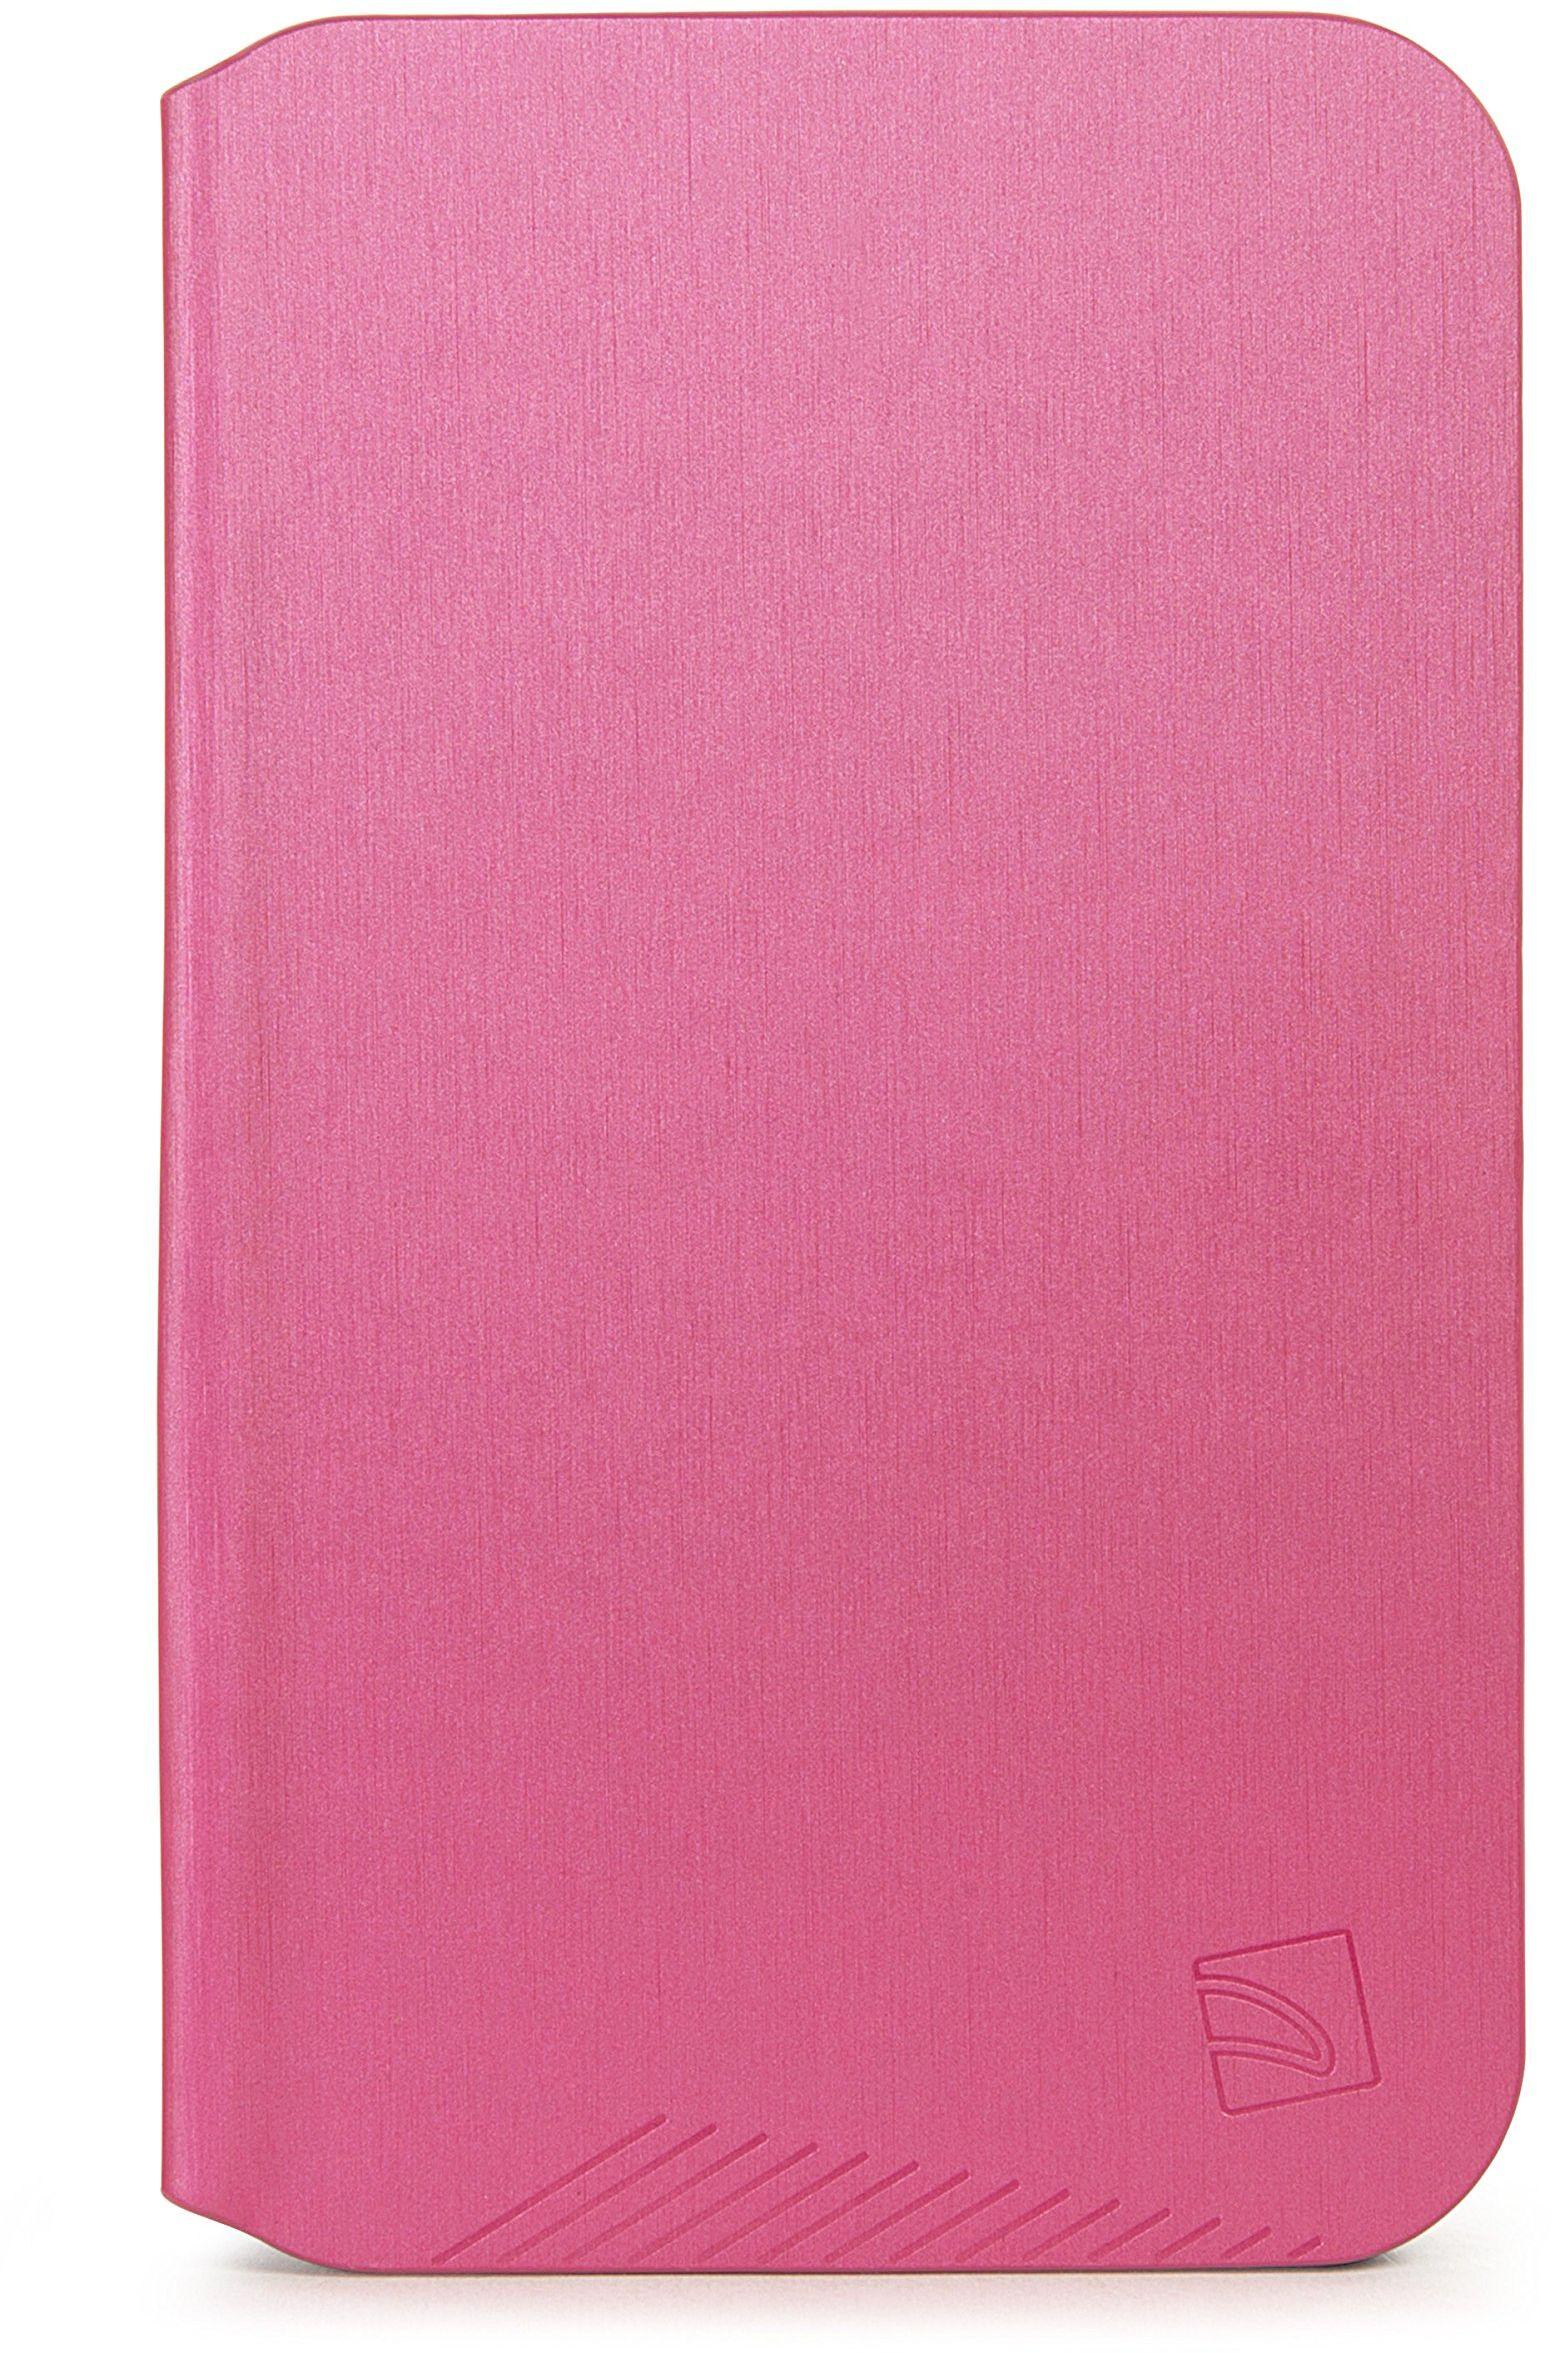 Tucano TAB-MS38-F sztuczna skóra pokrowiec ochronny do Samsung Tab3 20,3 cm (8 cali) różowy